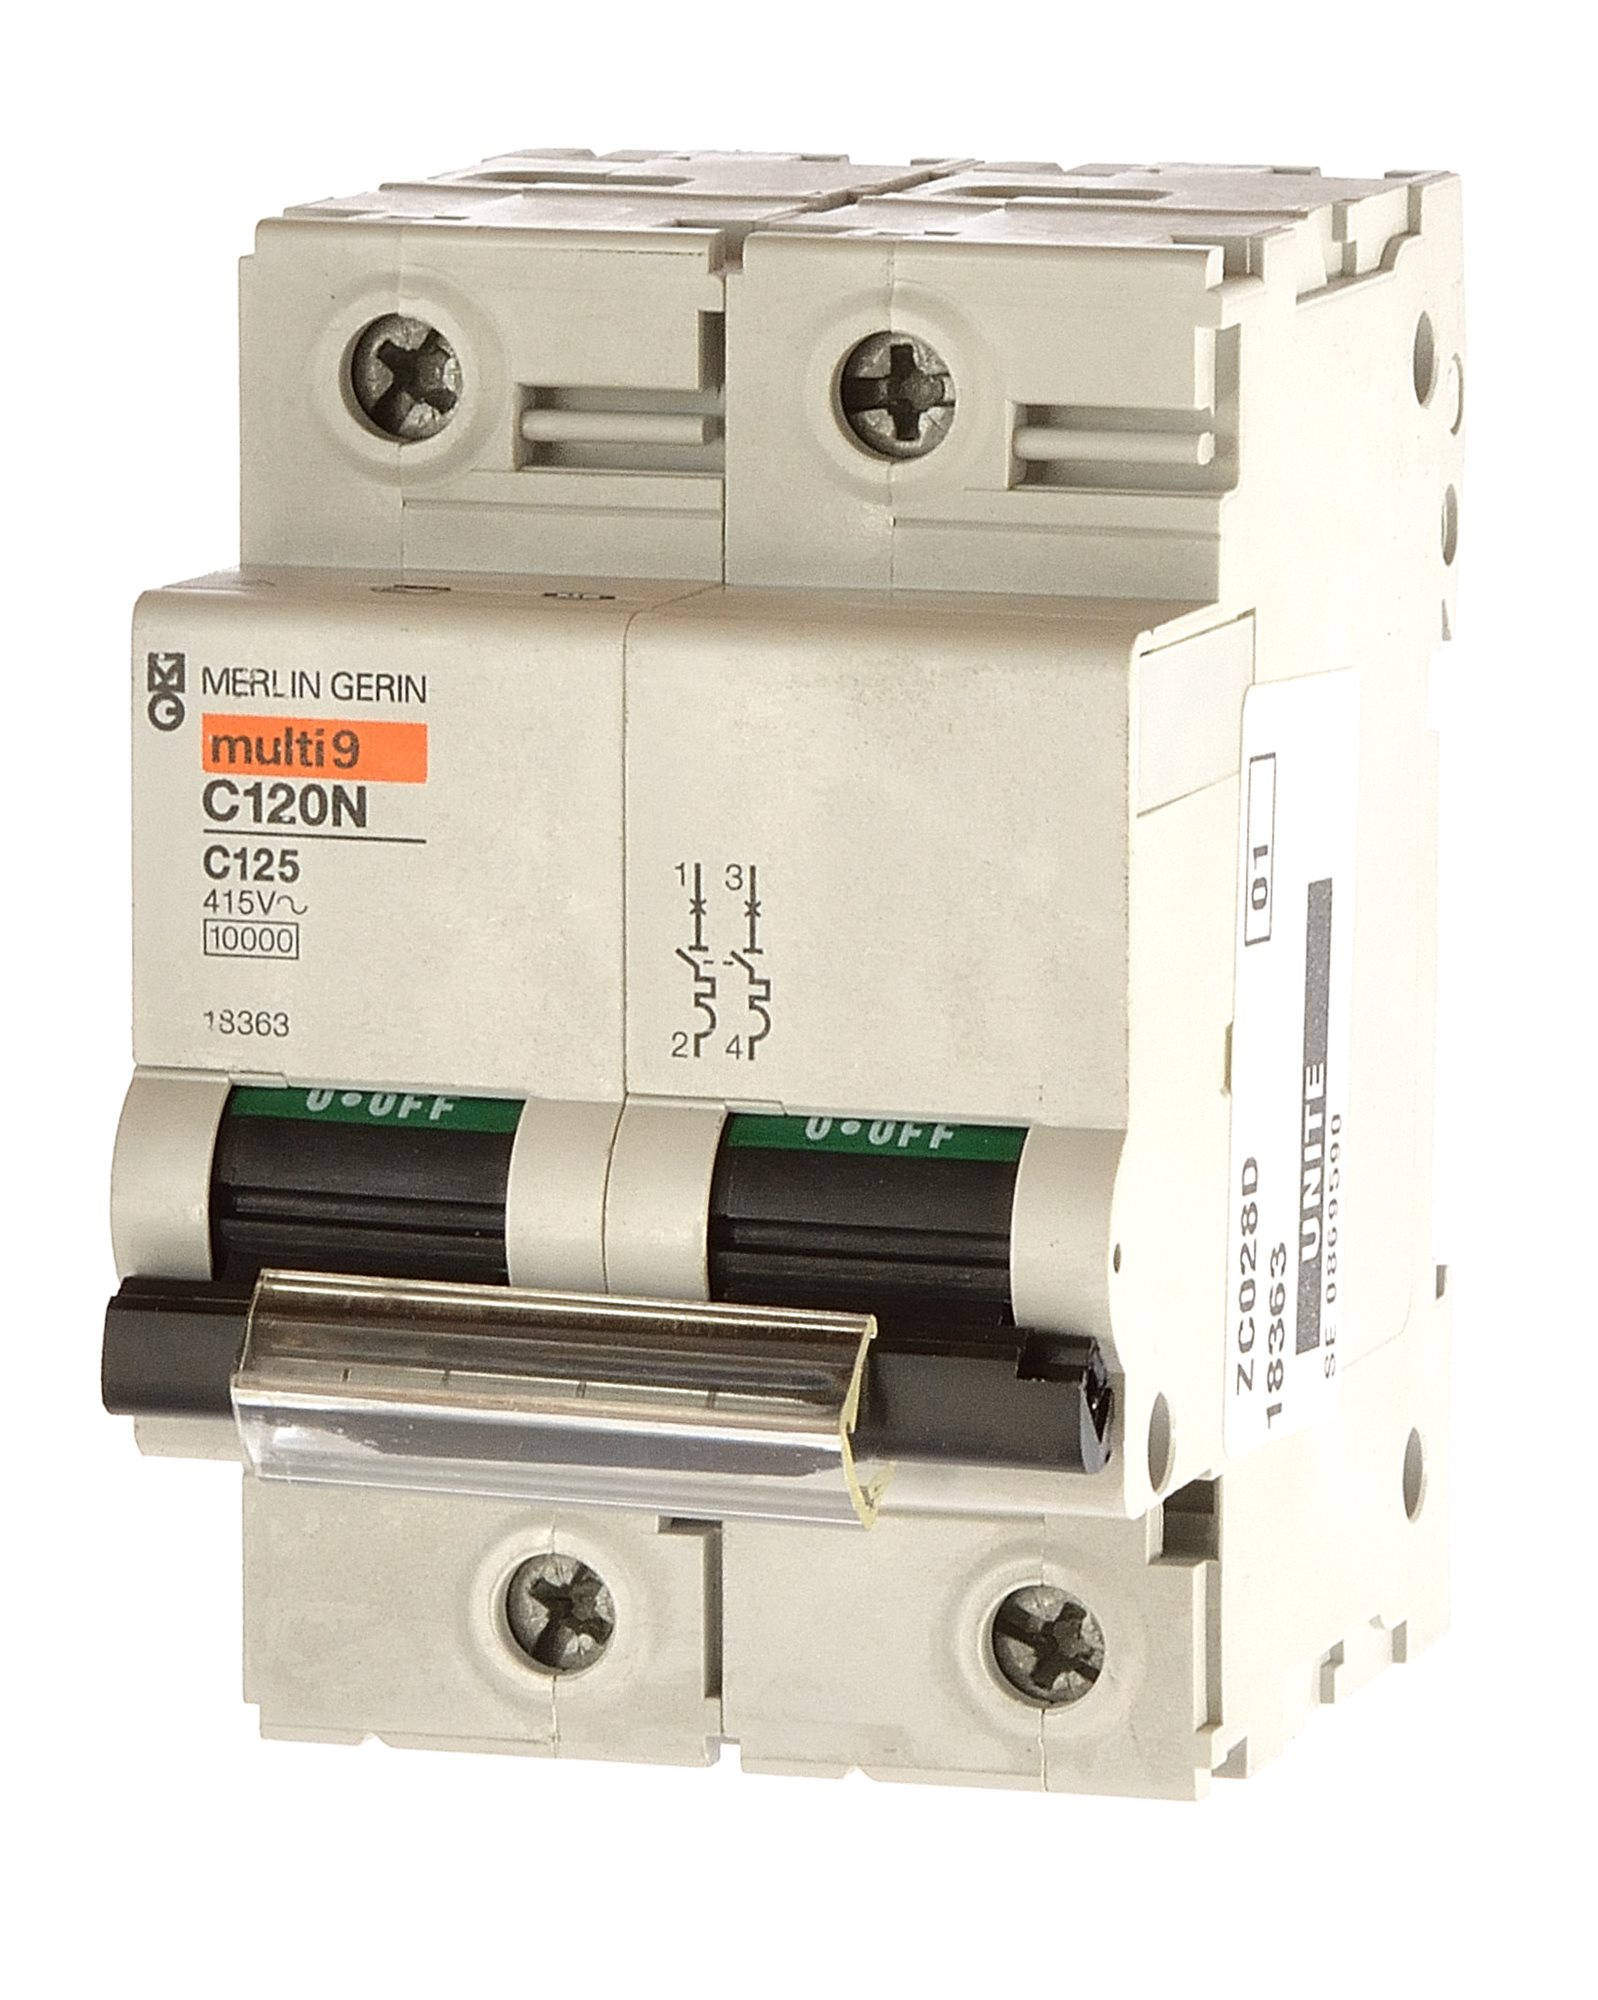 Merlin gerin multi9 c120n sicherungsautomat c125 125a 2 - Merlin gerin multi 9 ...